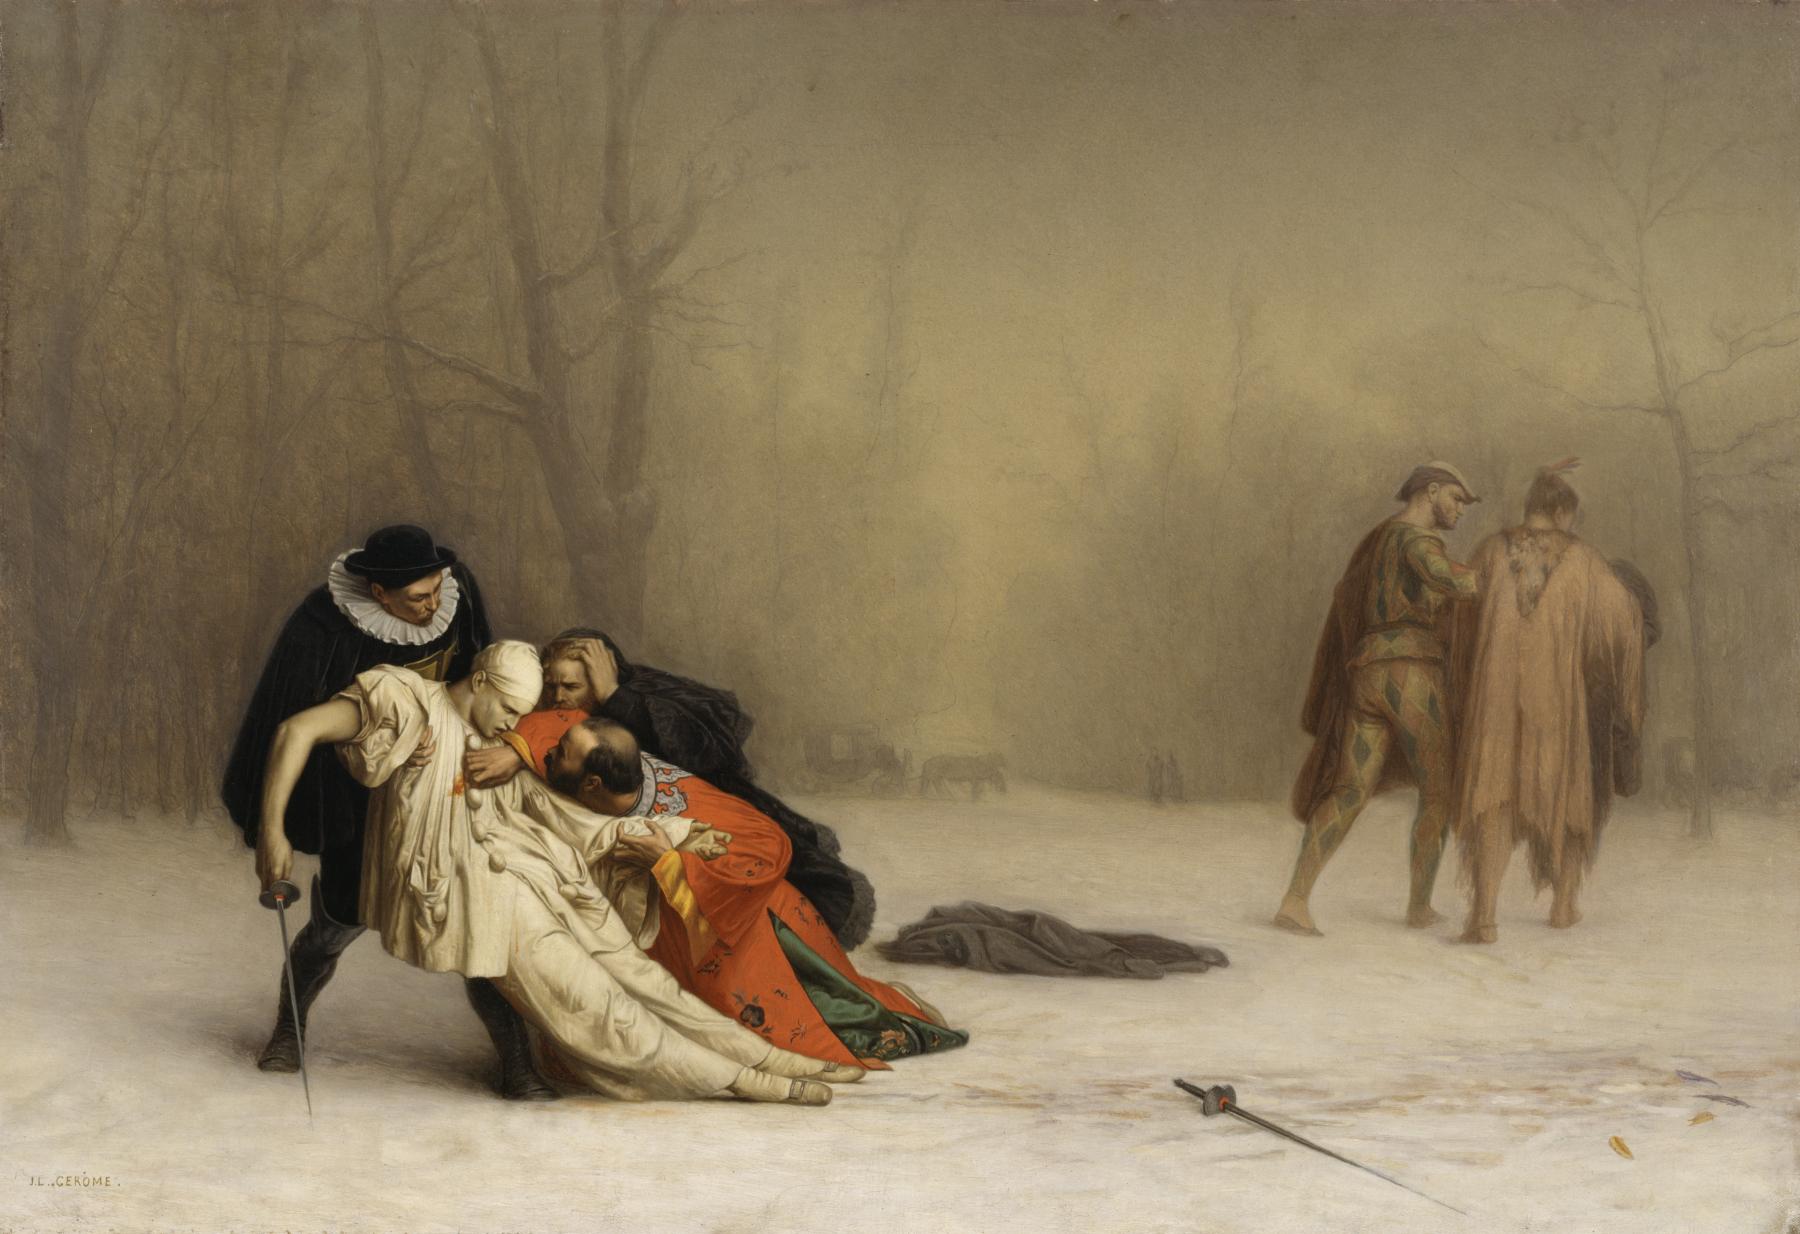 Duel after a Masquerade Ball - Jean-Léon Gérôme from Wikpedia